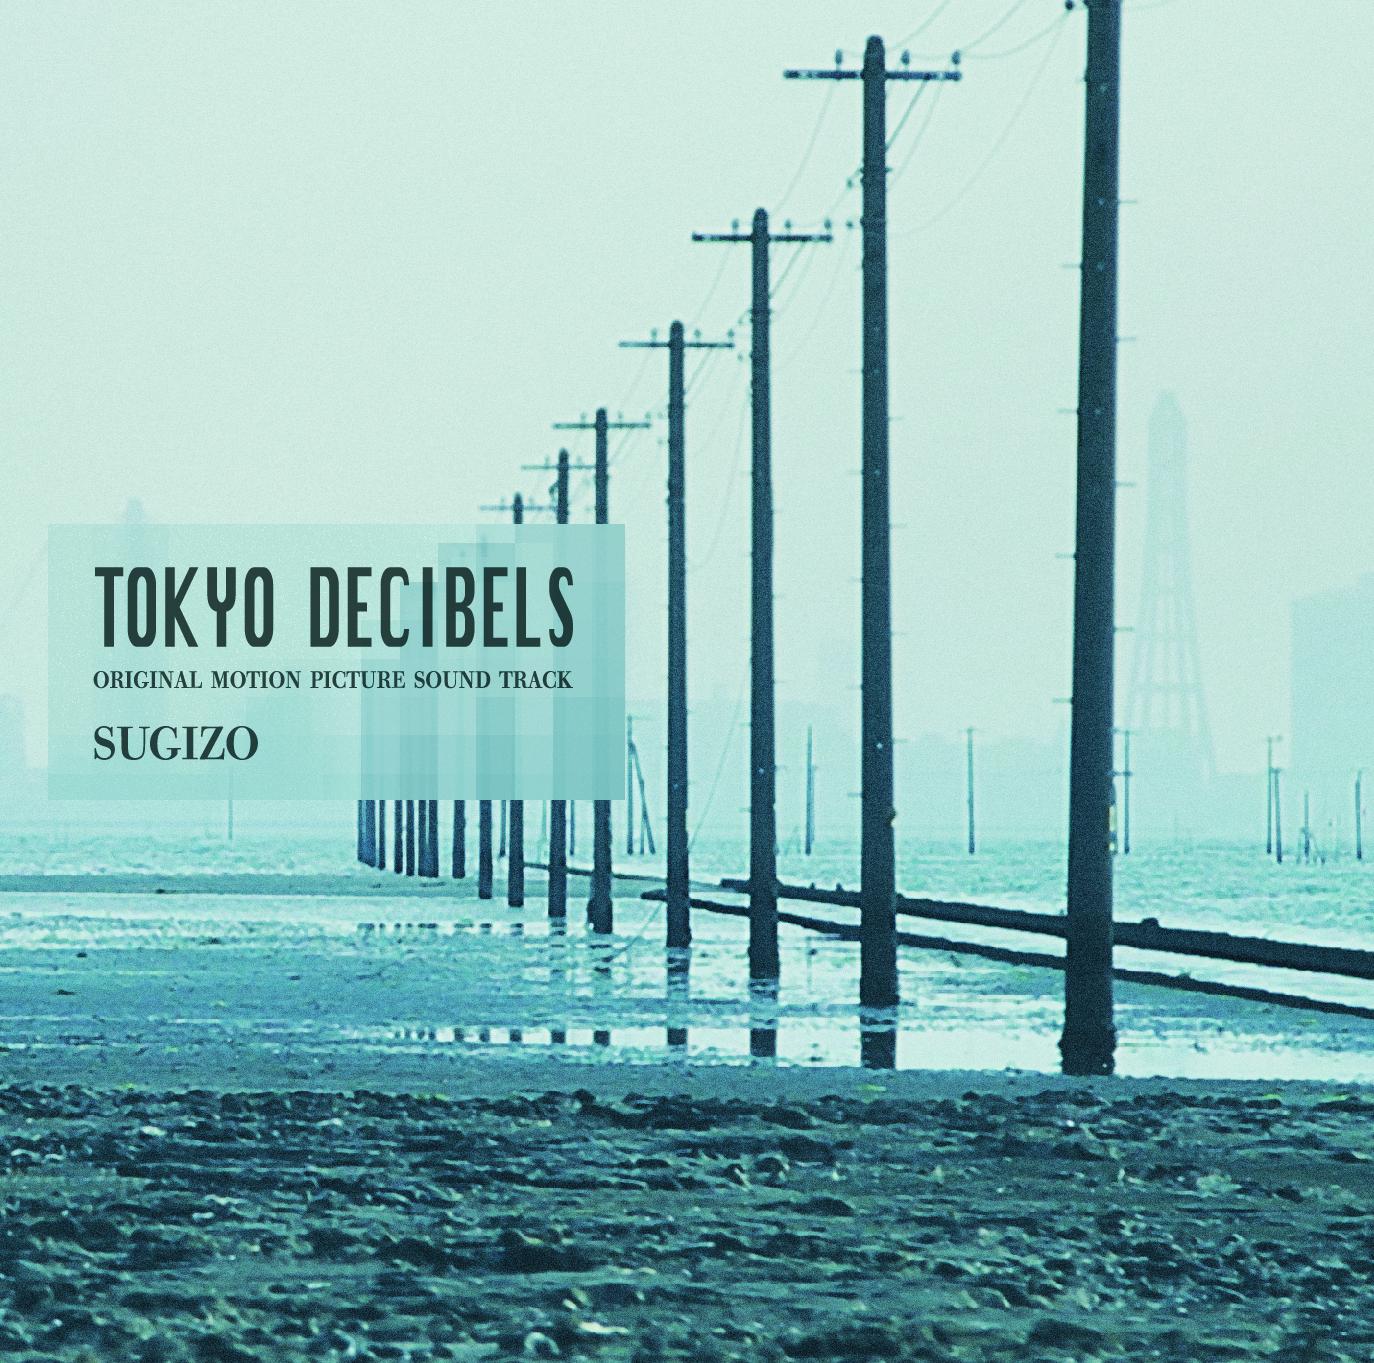 TOKYO DECIBELS 〜ORIGINAL MOTION PICTURE SOUND TRACK〜